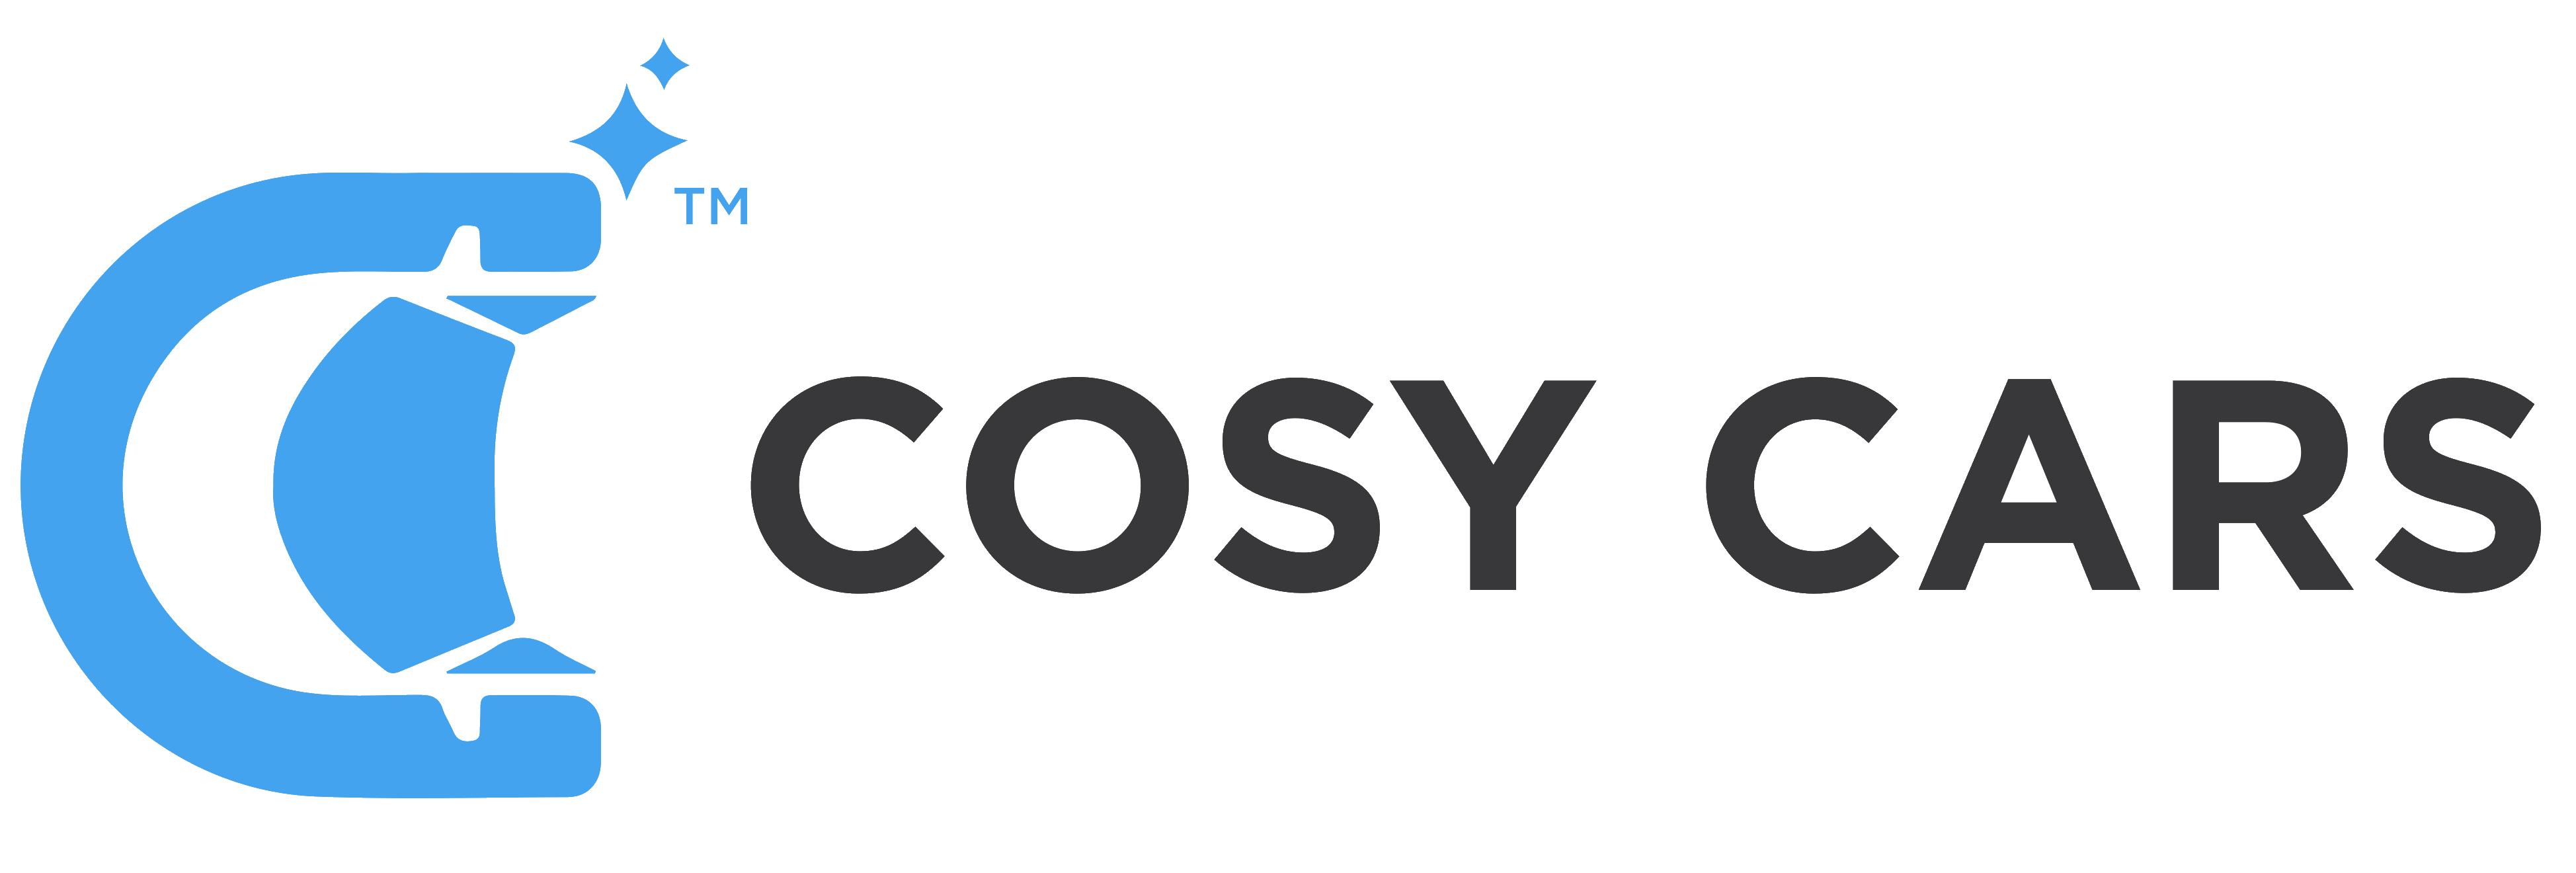 Cosy Cars